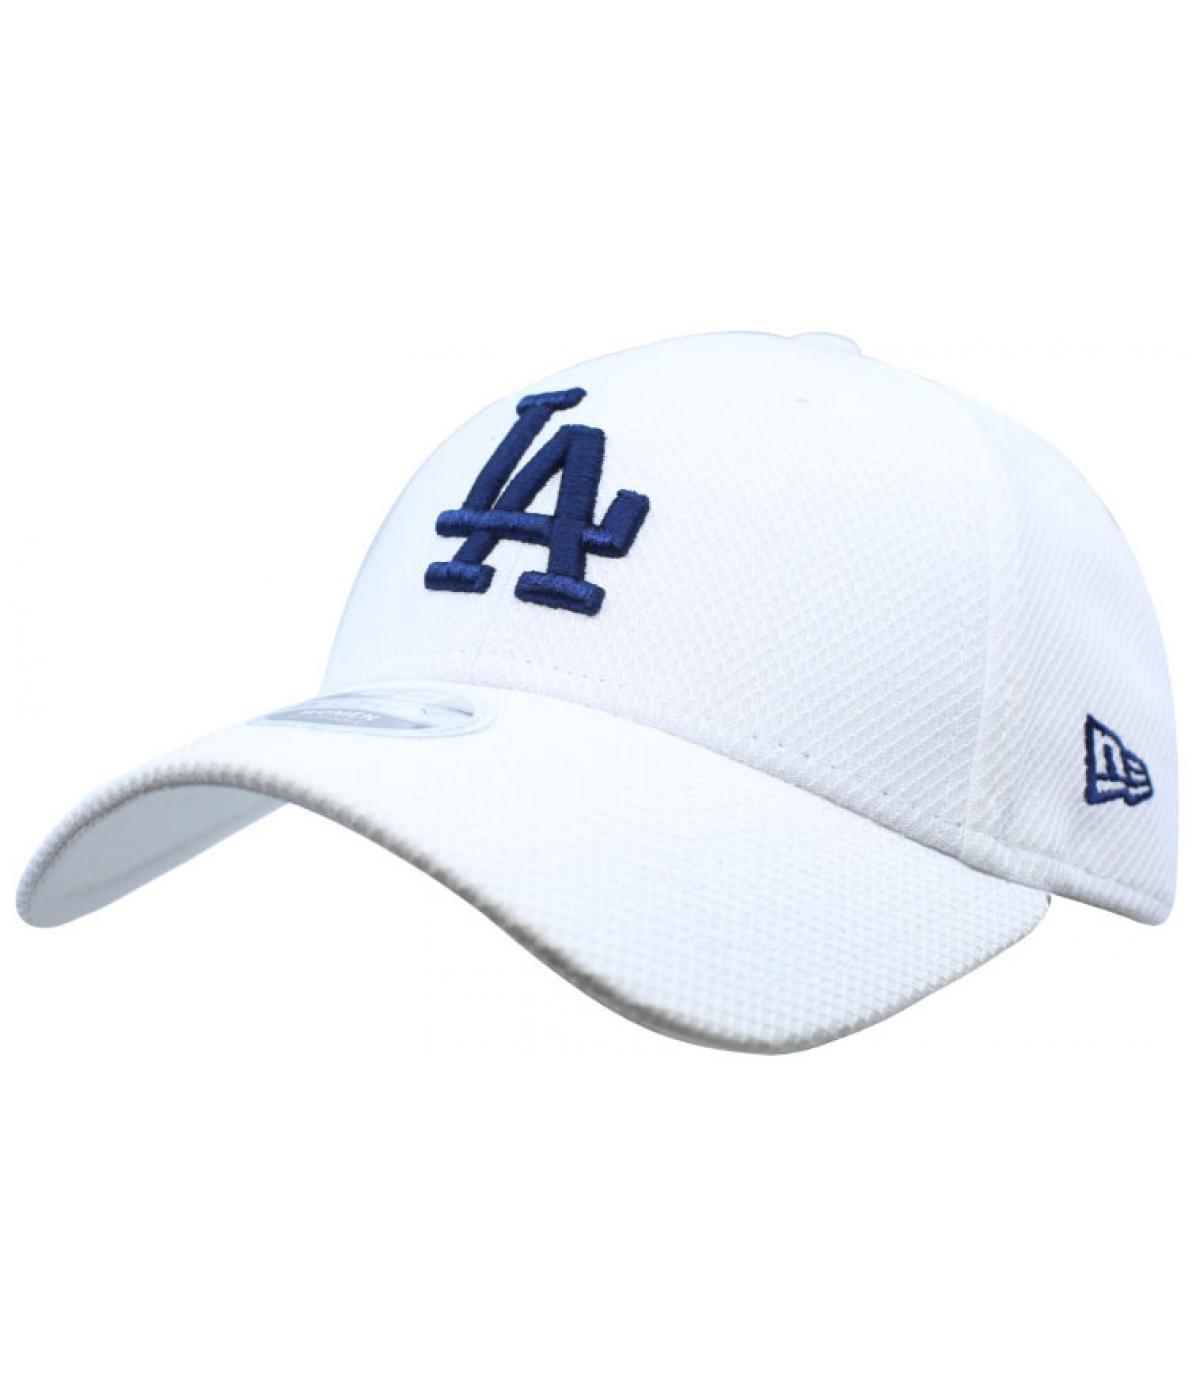 women LA cap white blue